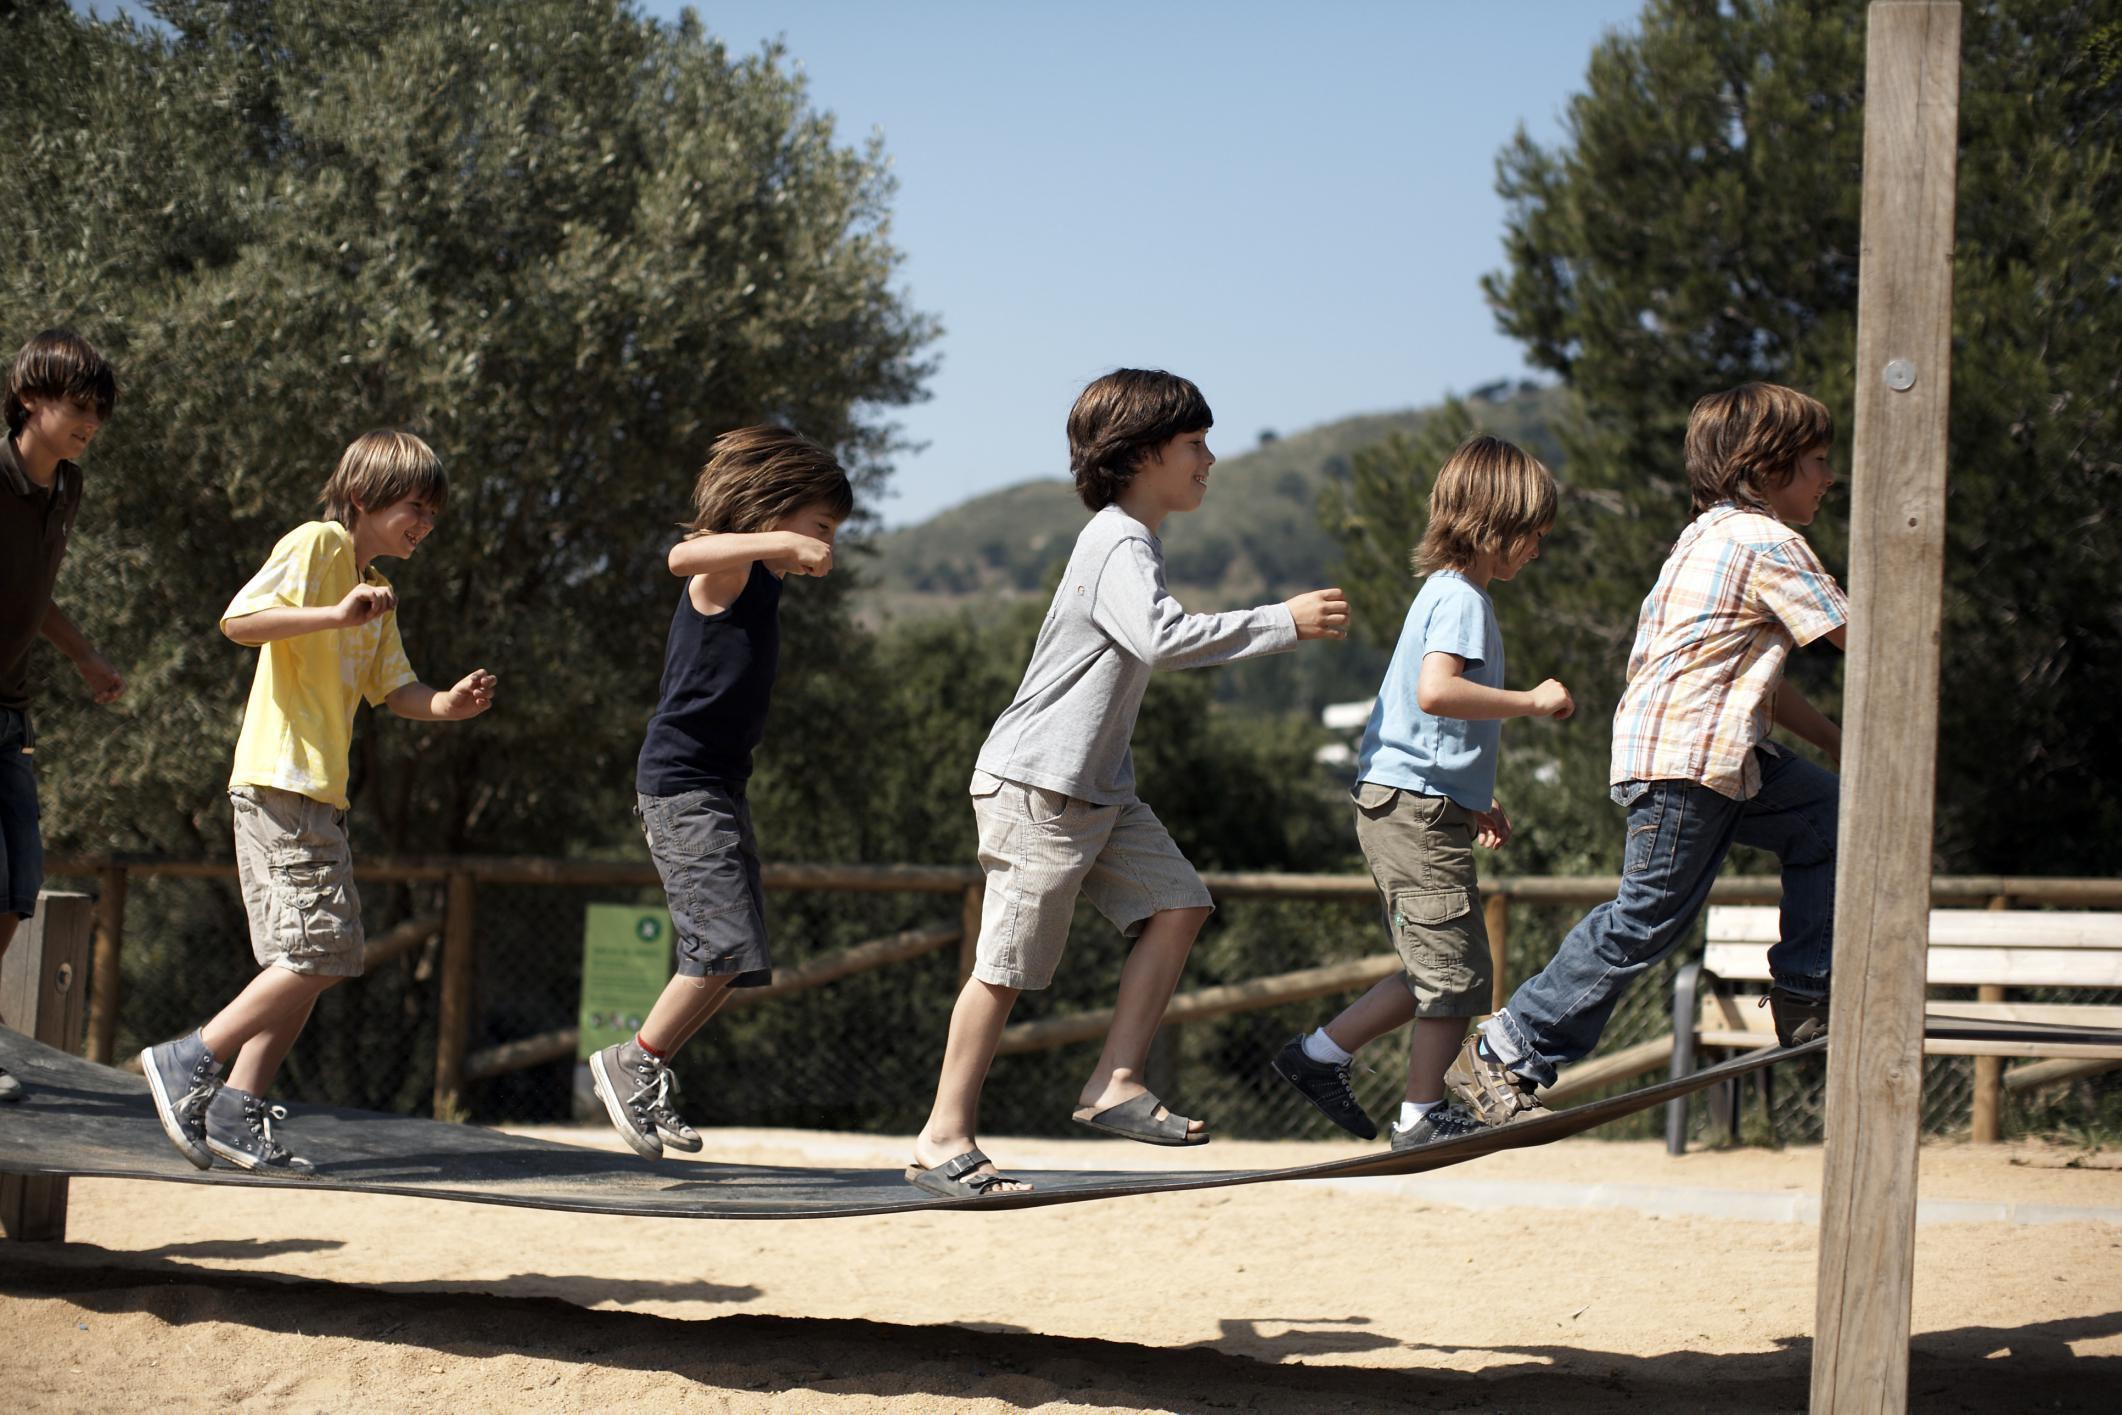 Gross Motor Skills and Delays in Children